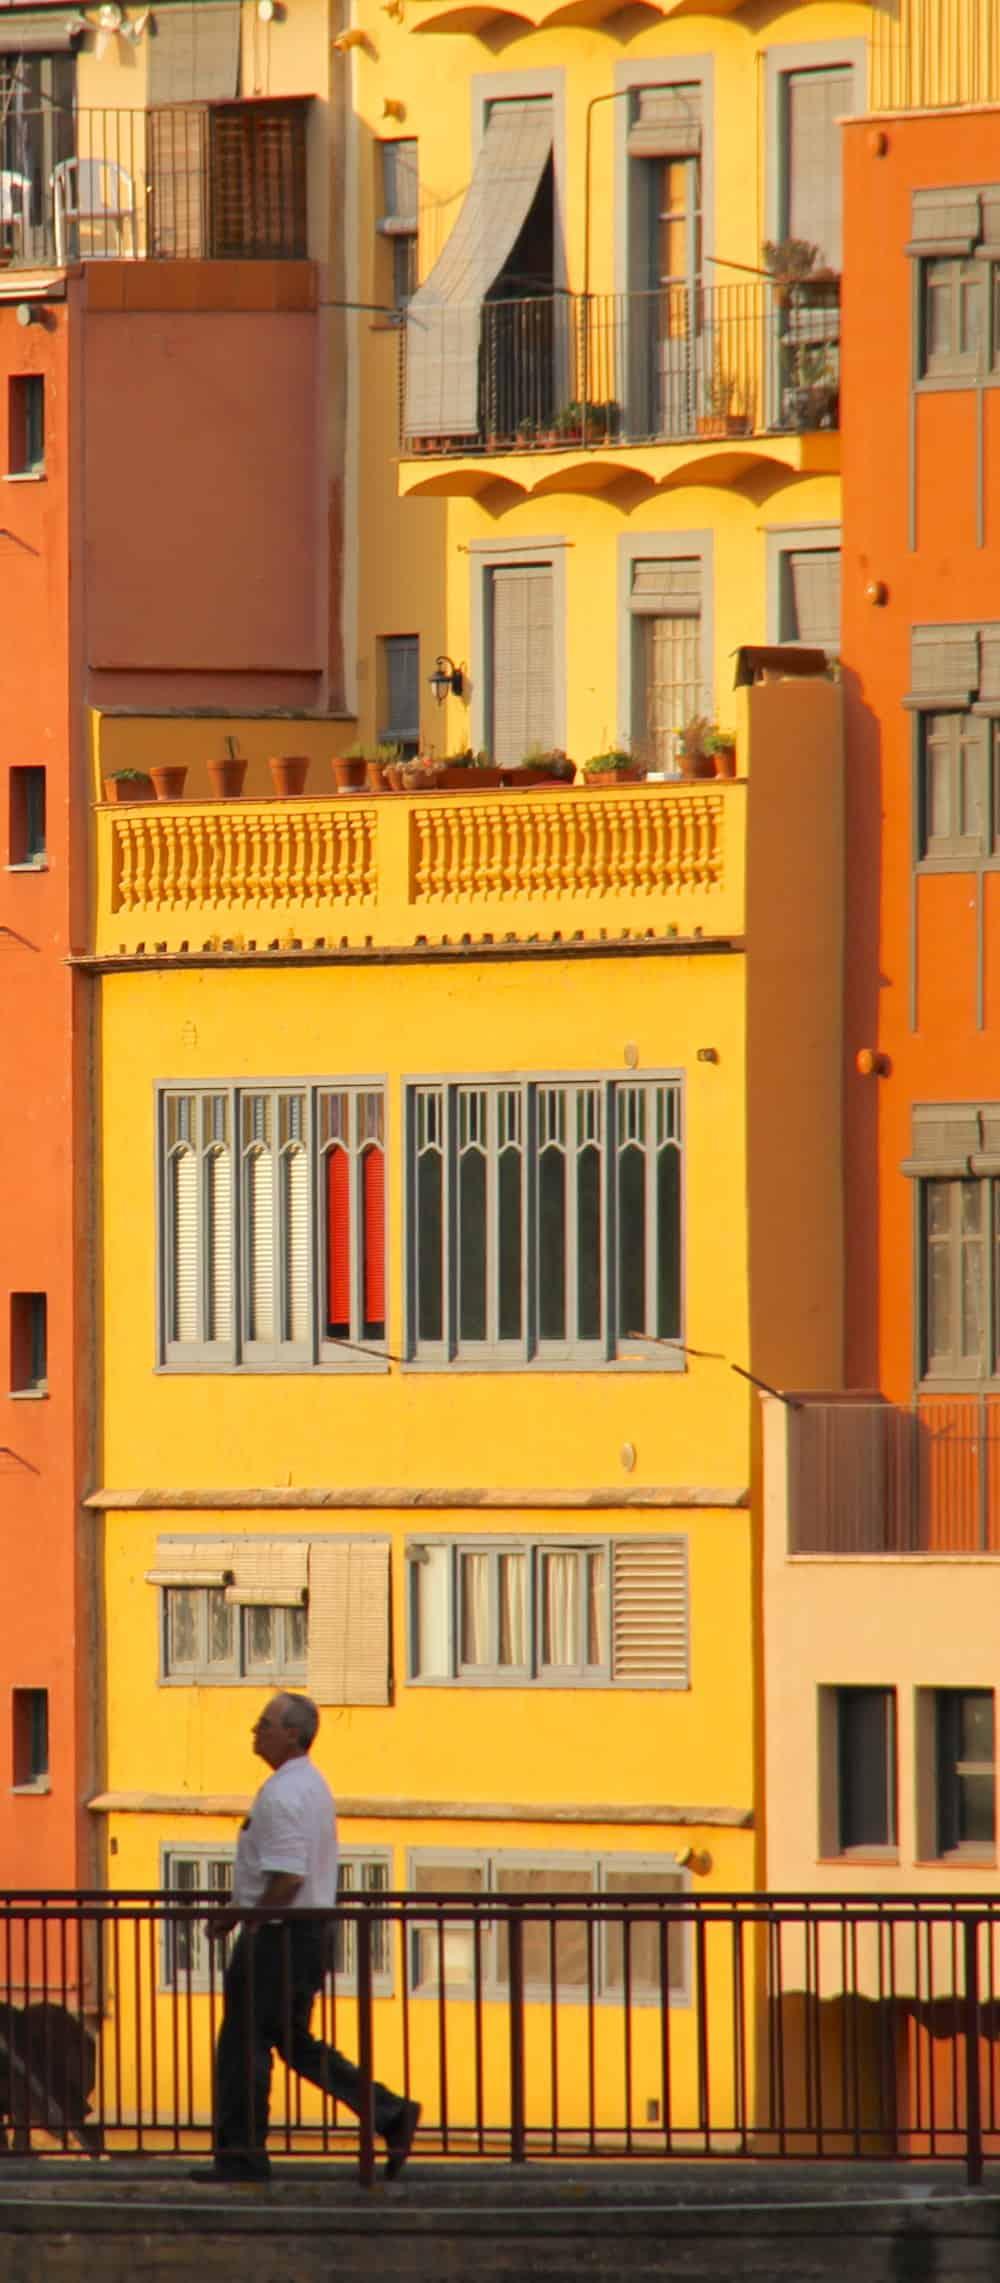 Medieval Girona via @insidetravellab